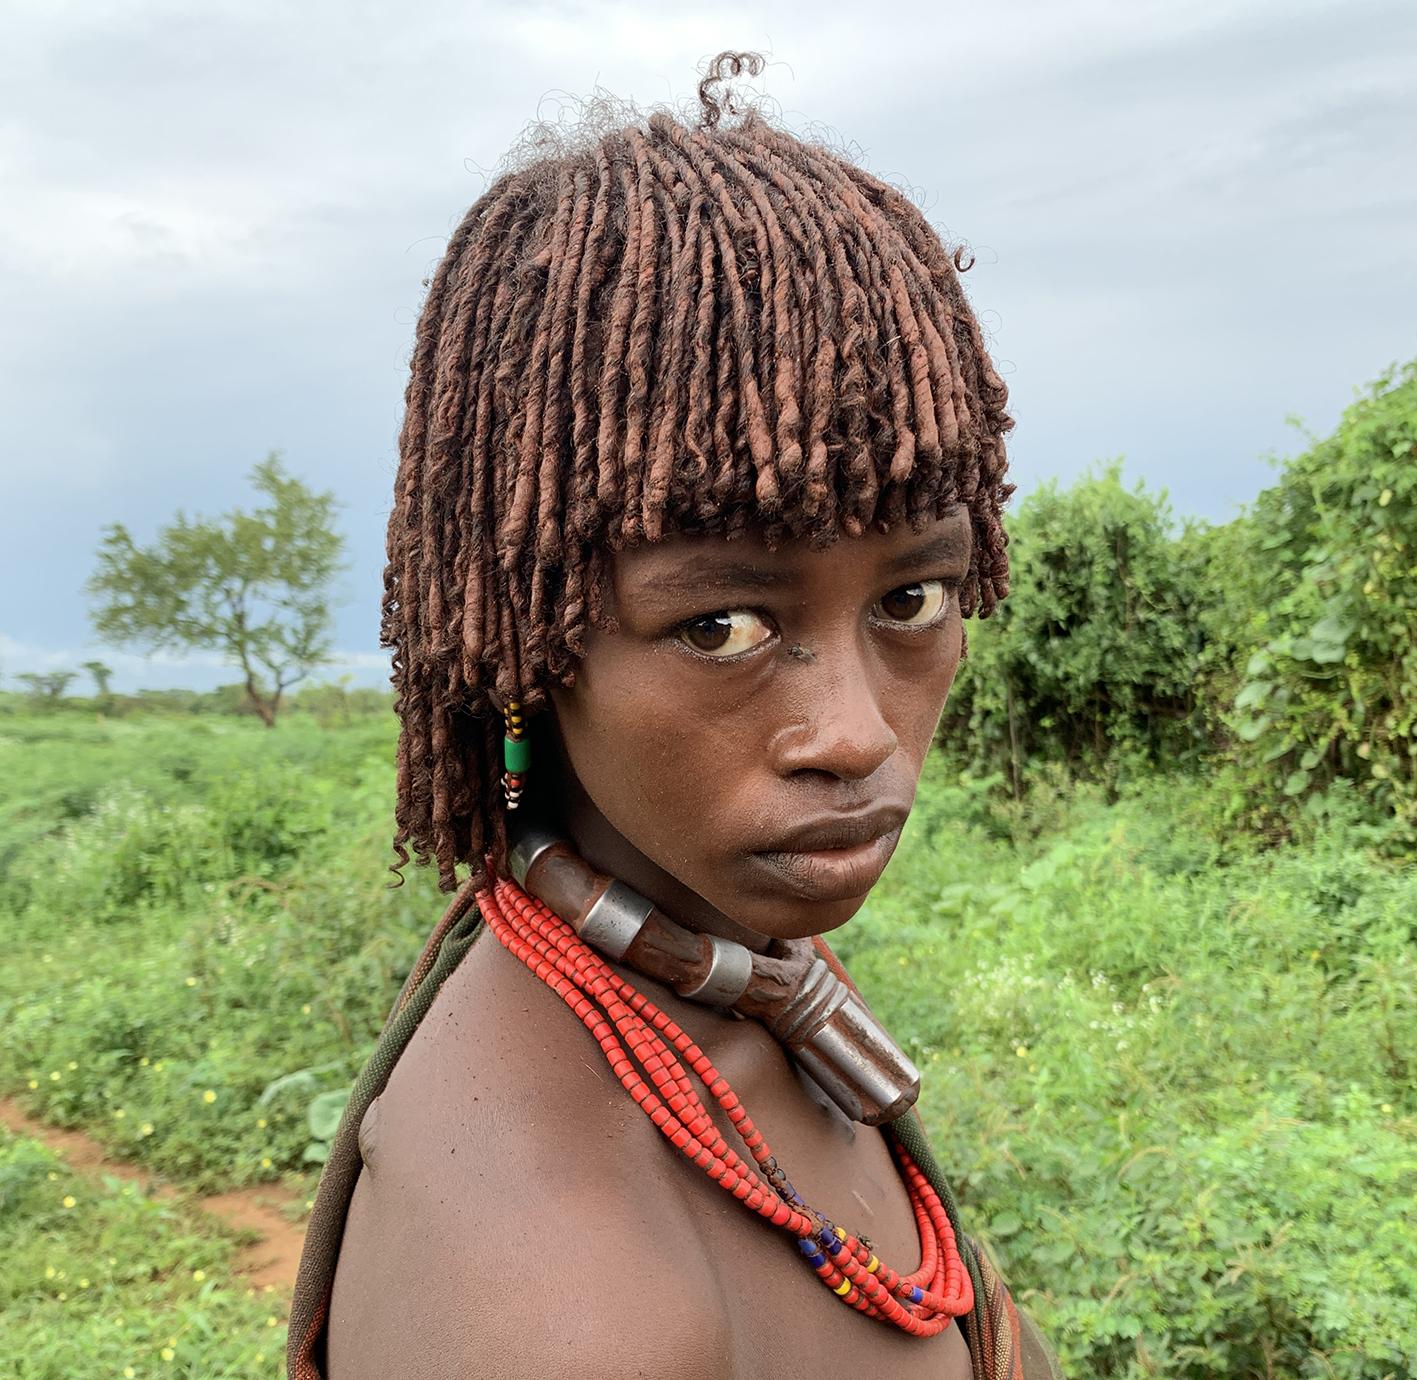 Hamar lady, Omo River Valley in Ethiopia